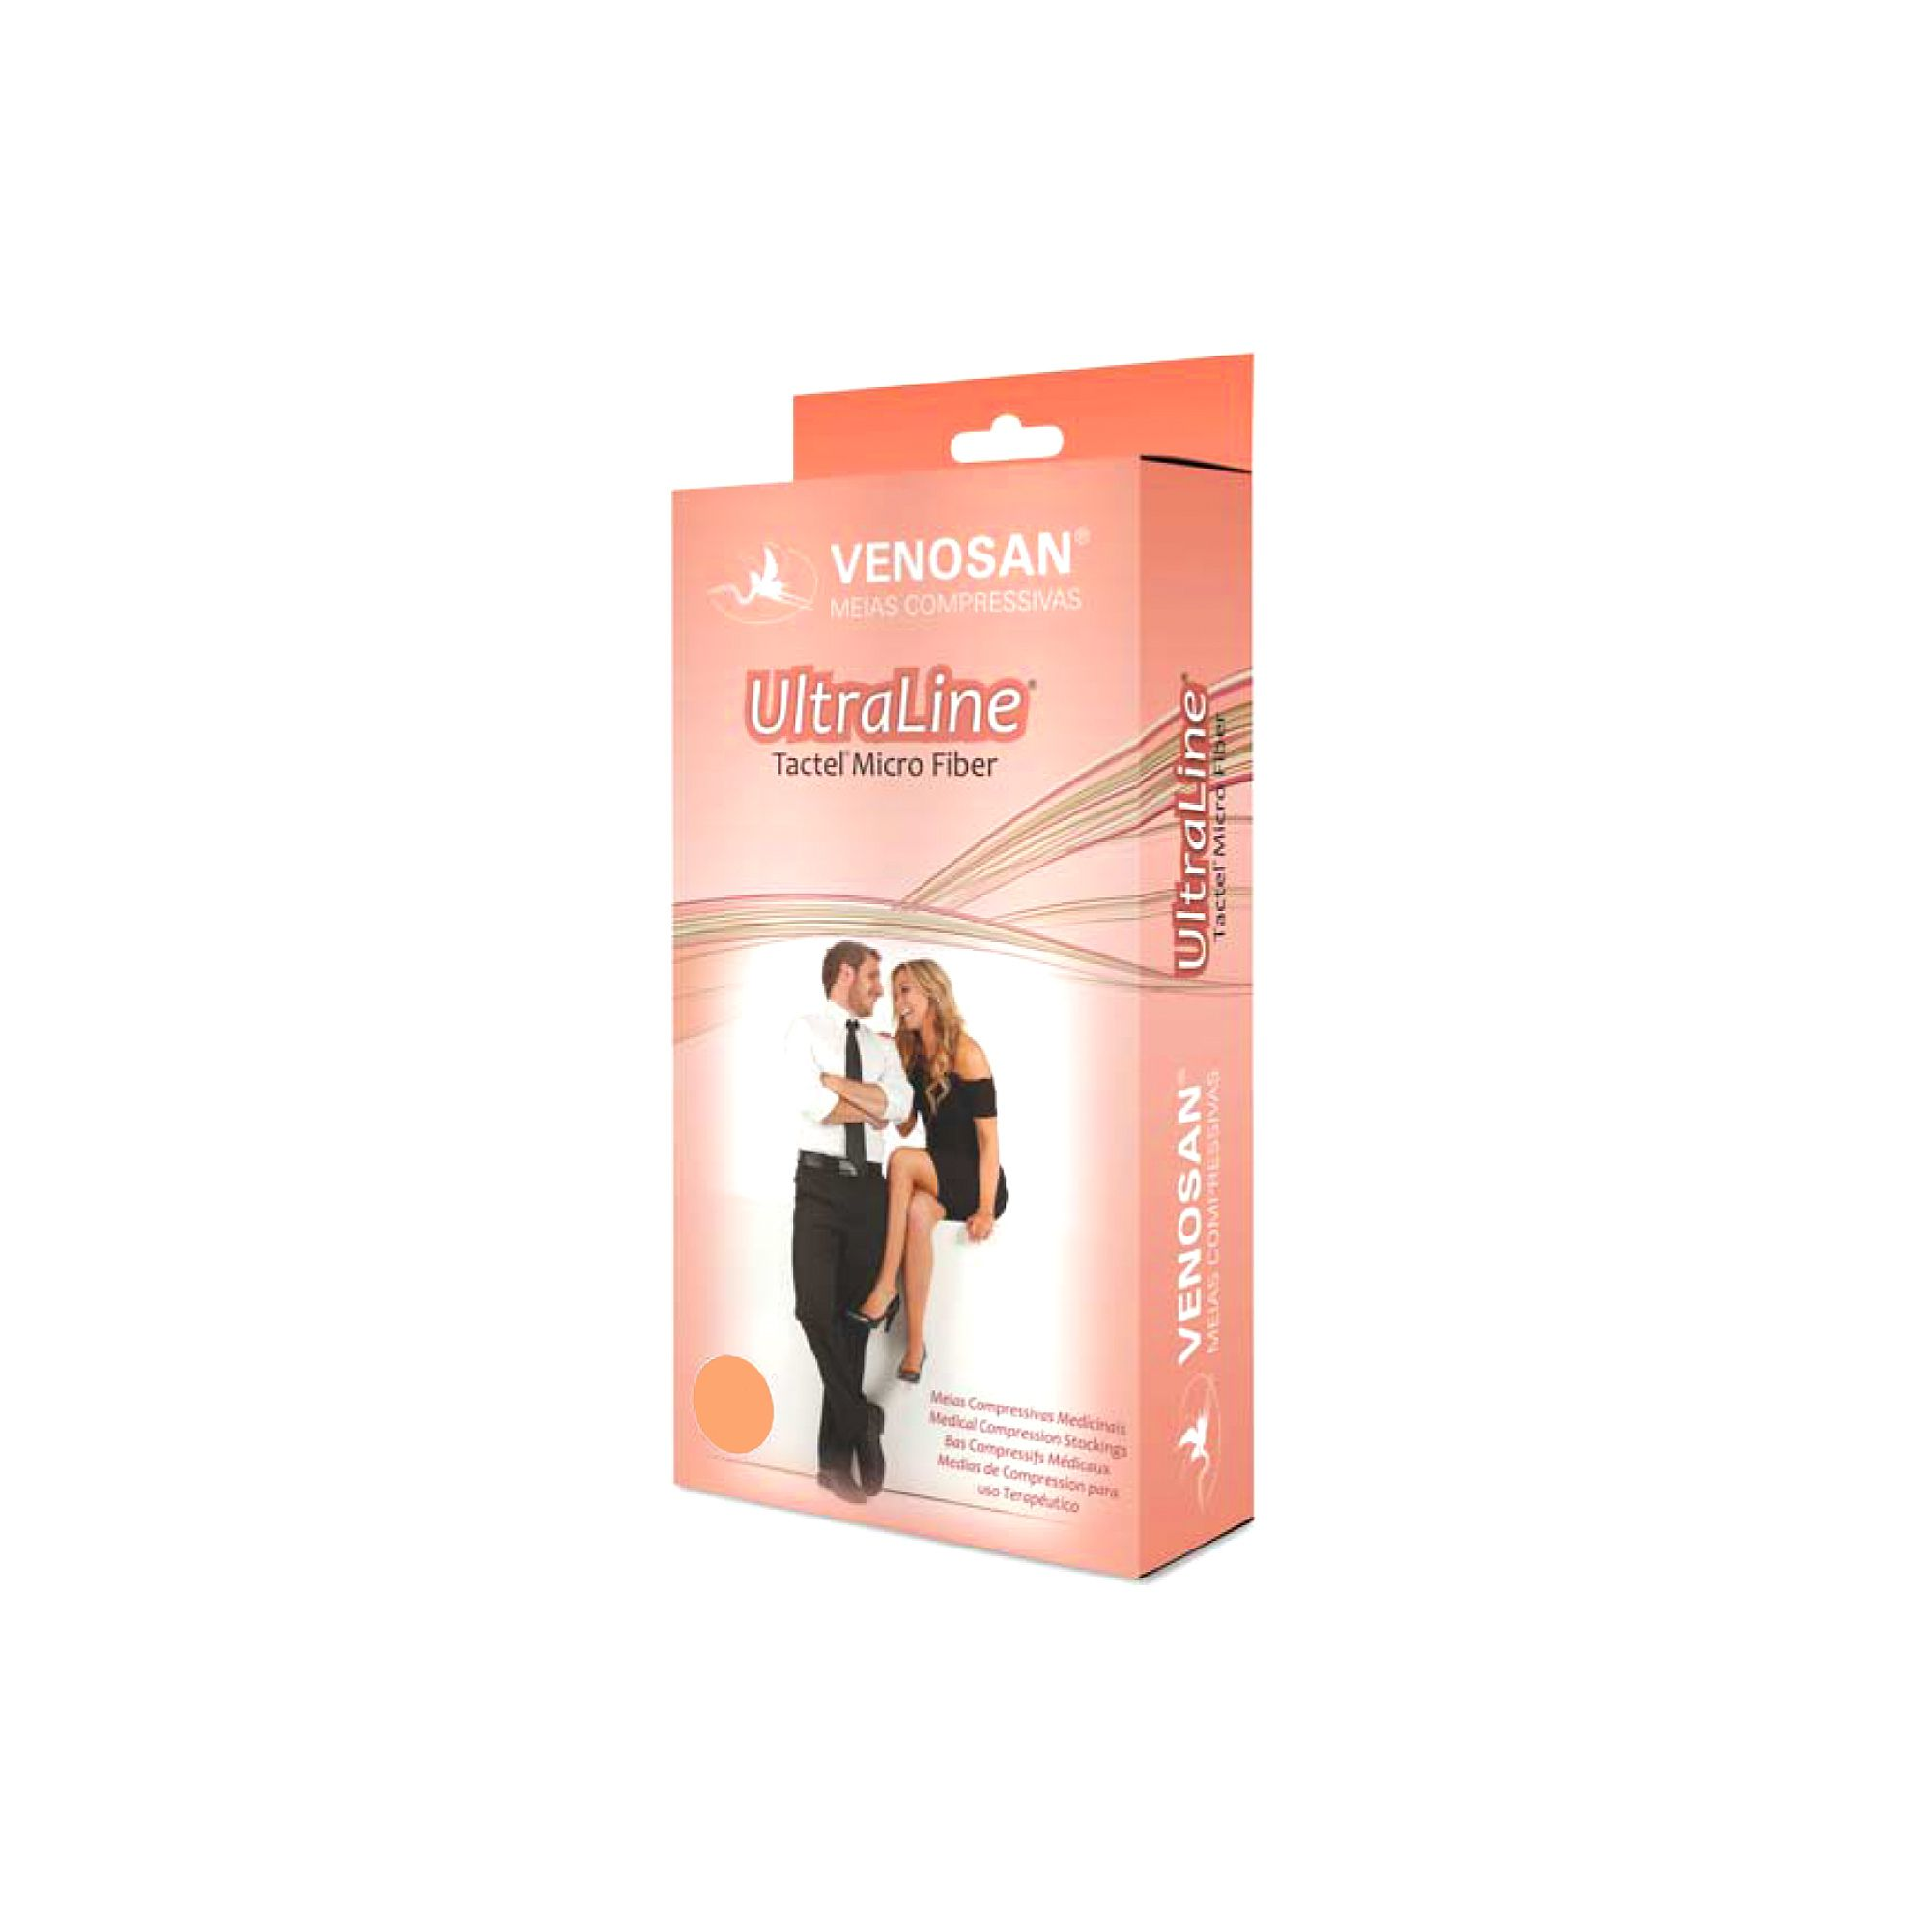 Meia elastica media compressão 20 30 mmhg ultraline 4000